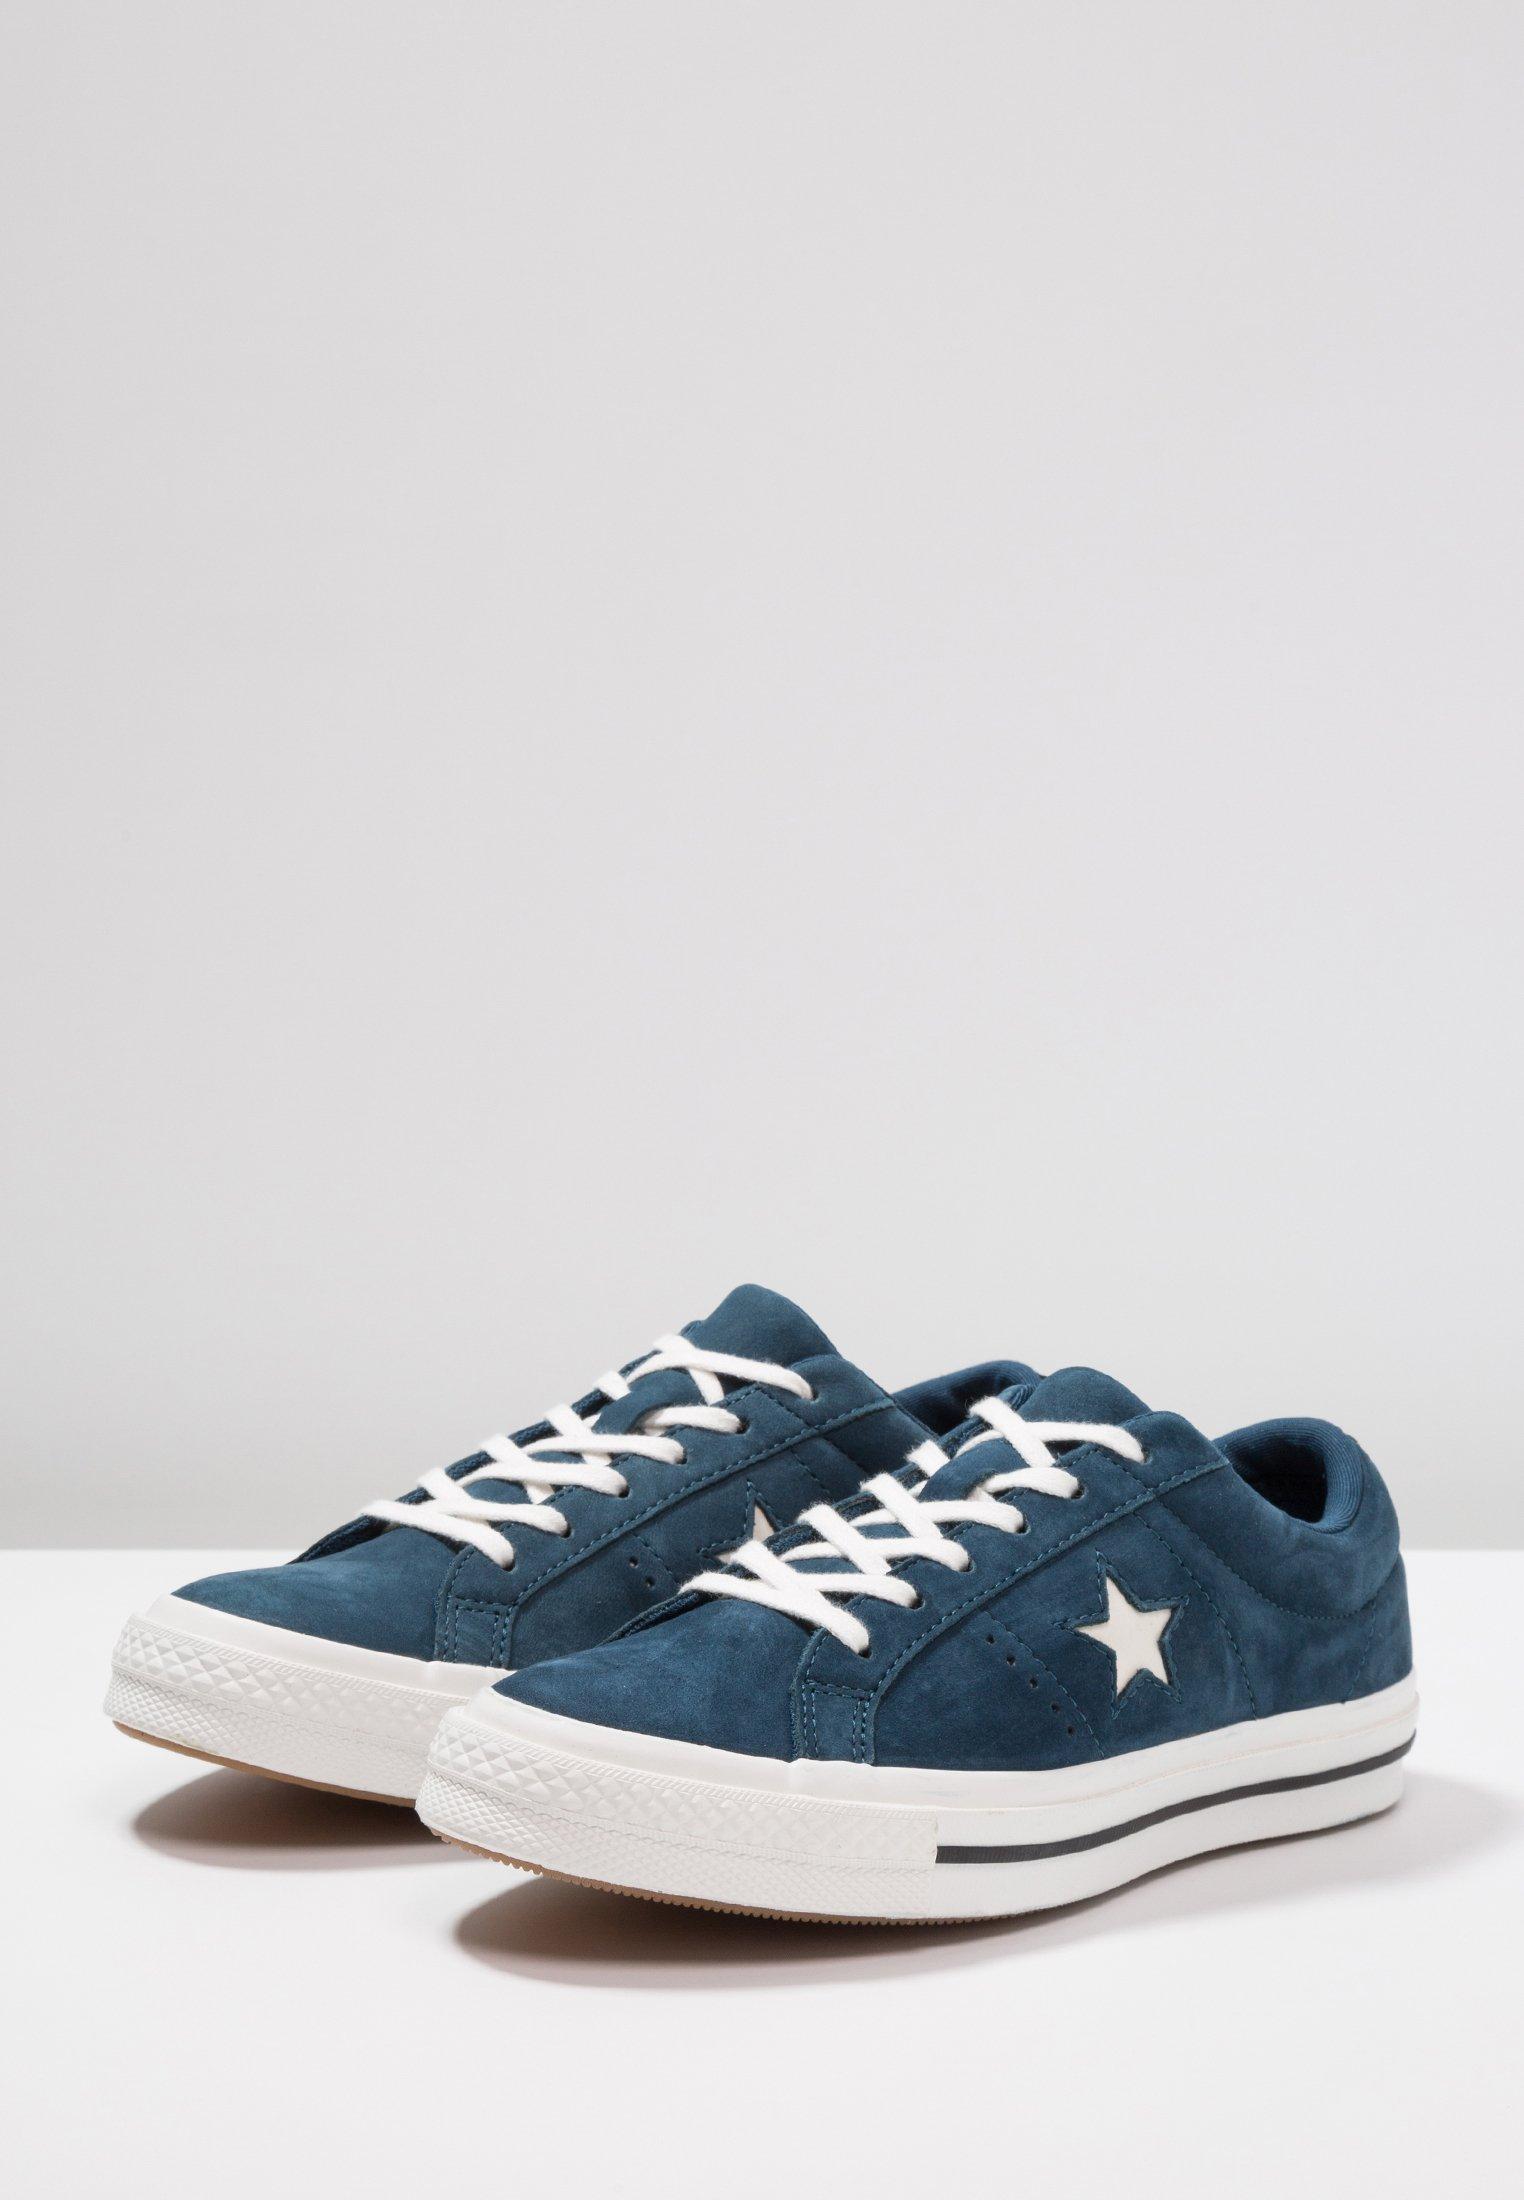 Blue Fir One White black Converse Basses vintage StarBaskets eW2IYEDH9b